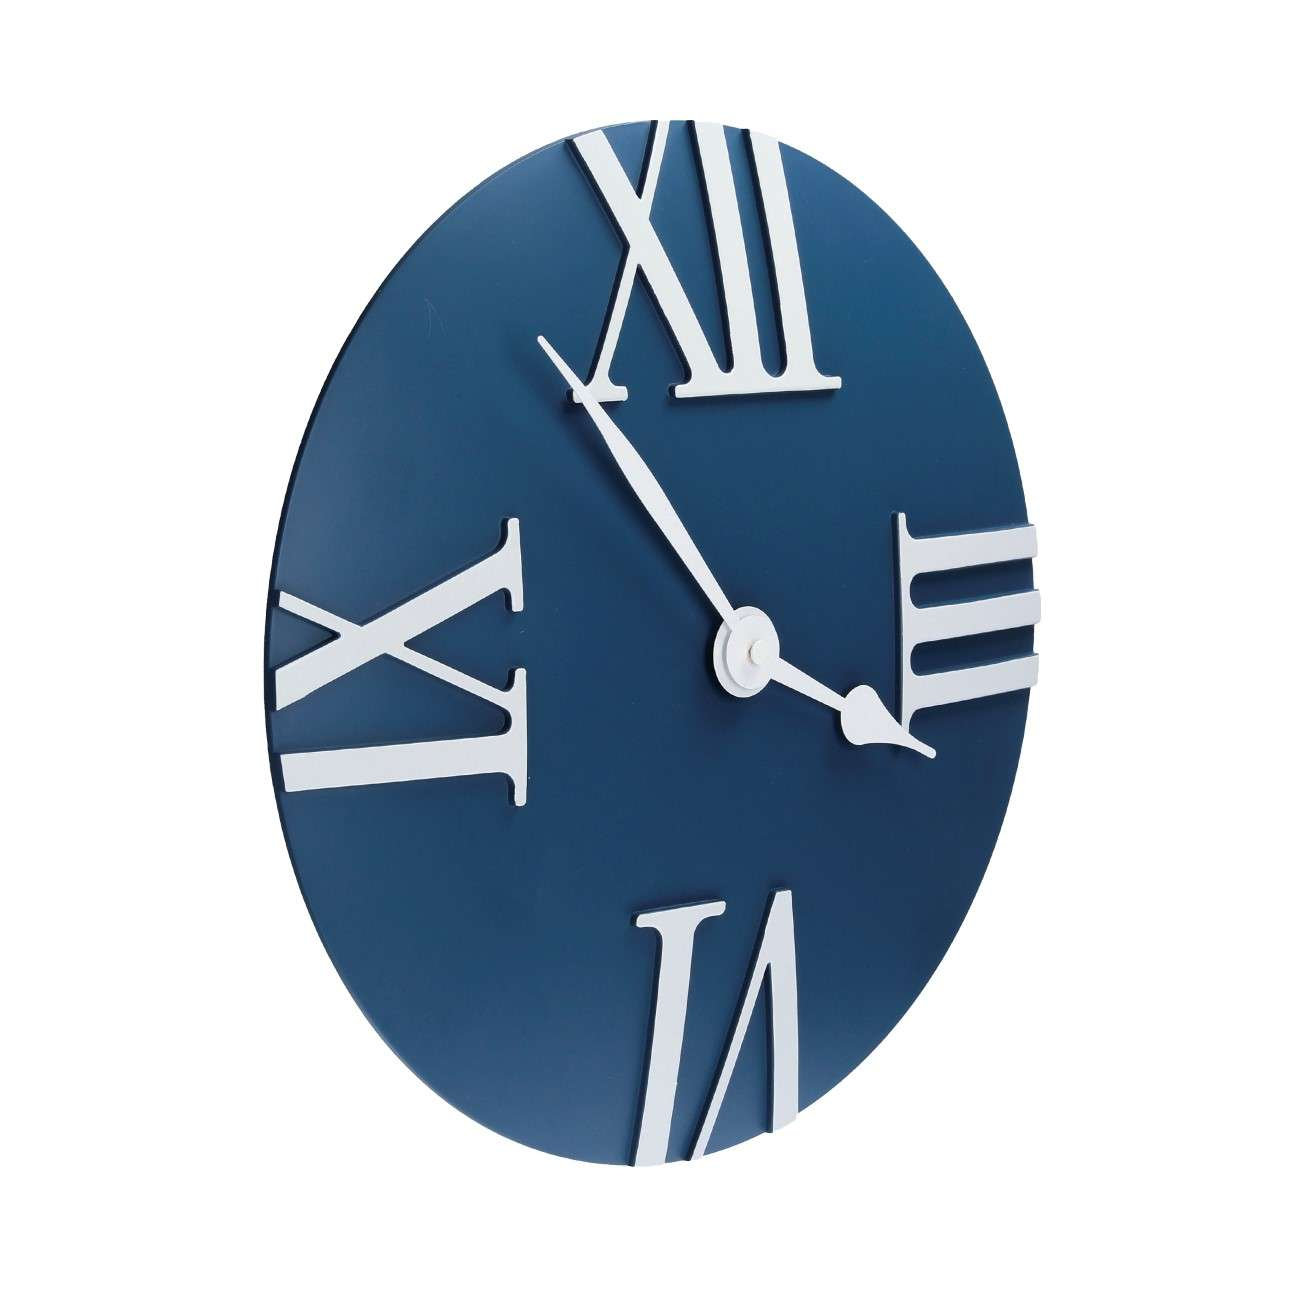 Retro blue clock